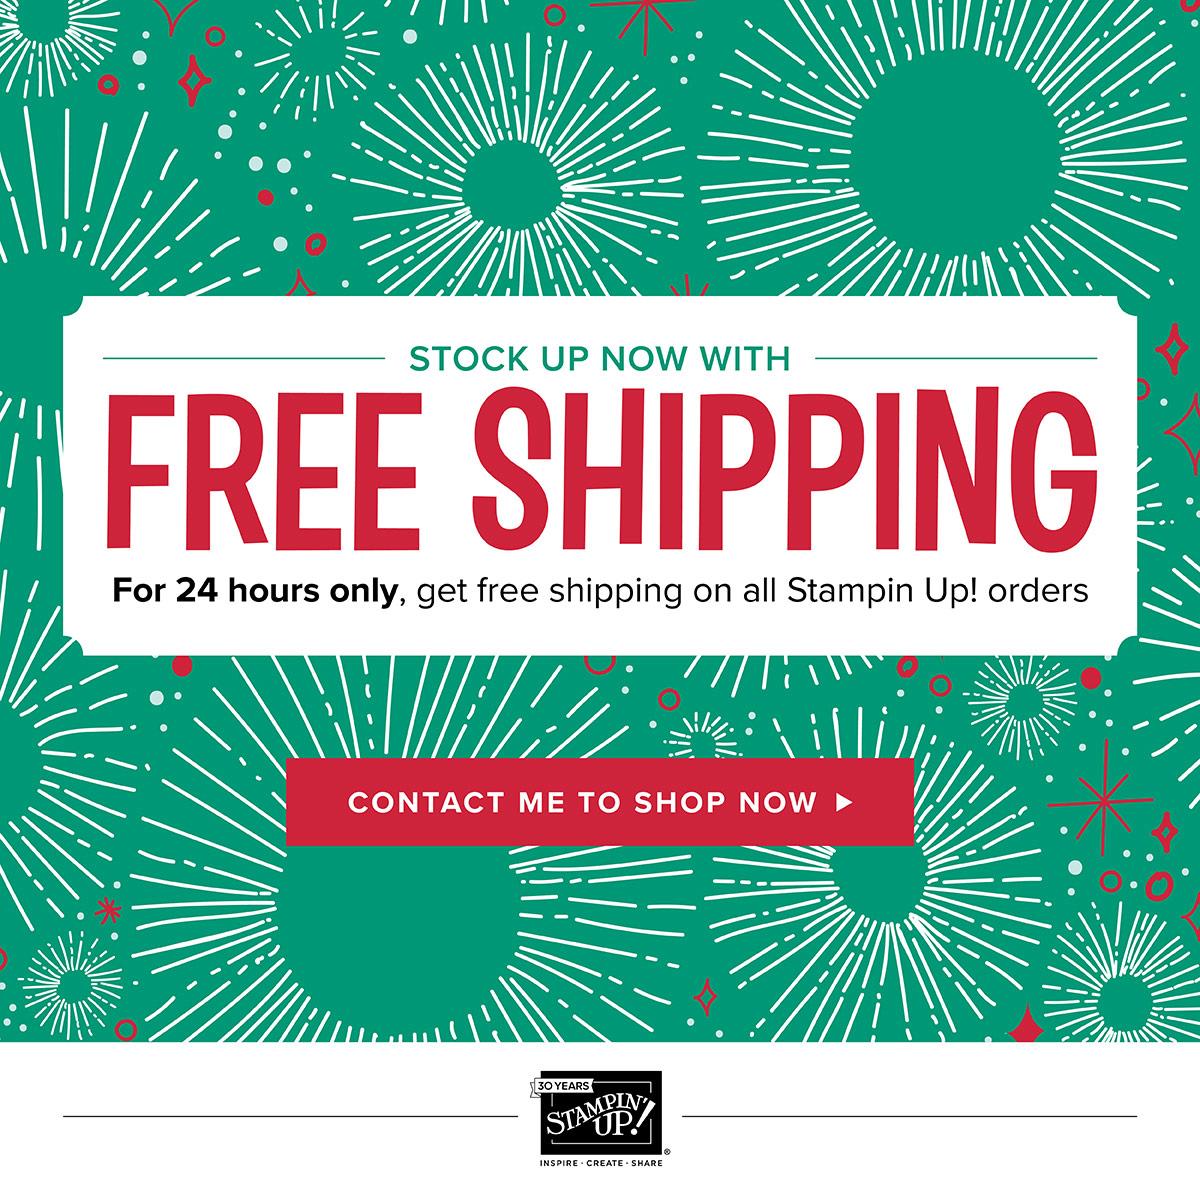 free shipping when you shop now